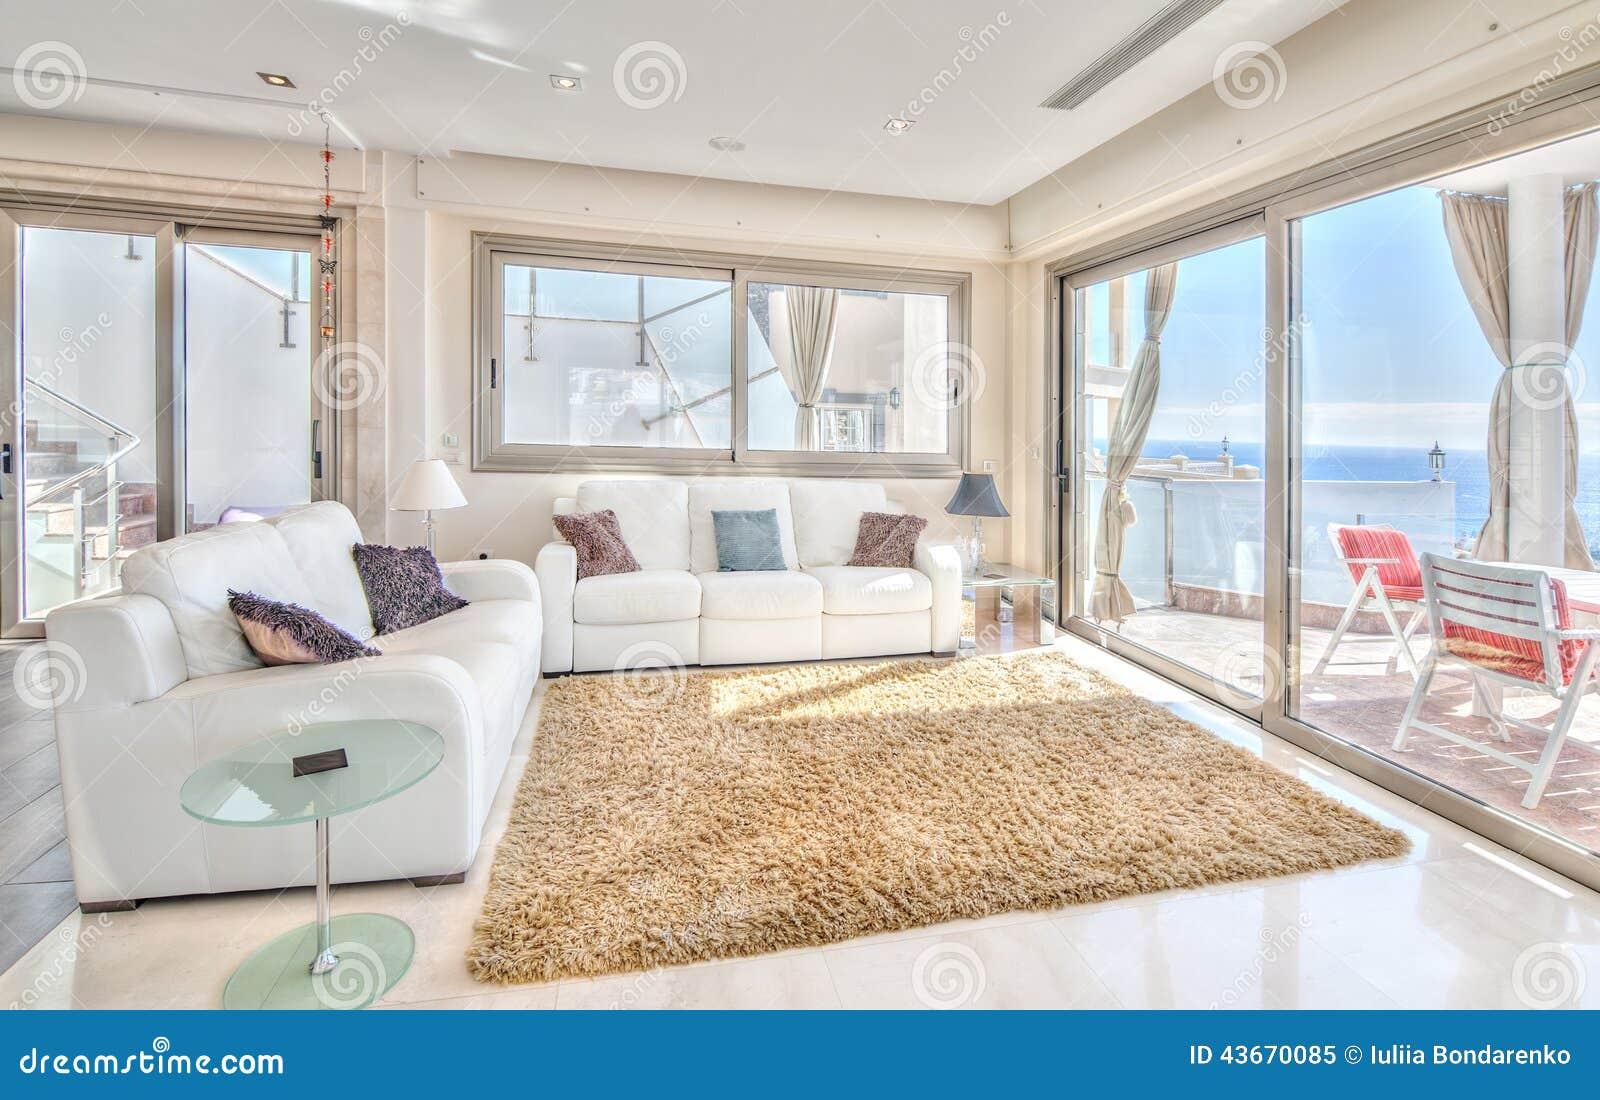 Salon D\'Exlusive En Villa Moderne Photo stock - Image: 43670085